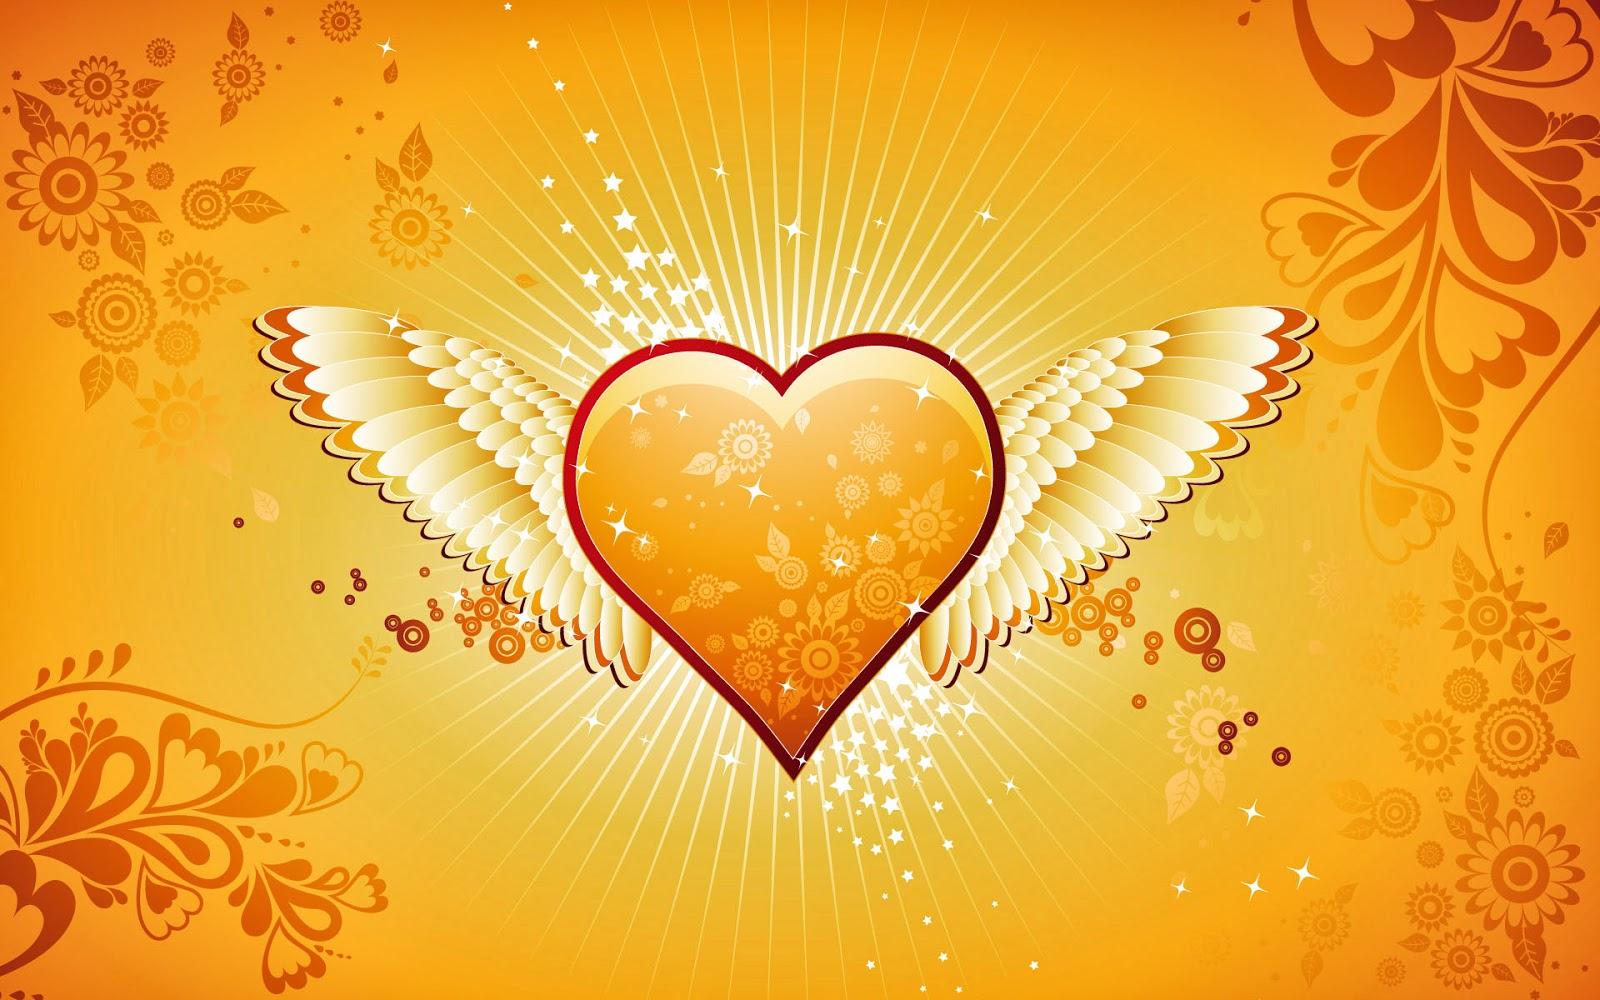 Fondos De Pantalla Gratis San Valentin 16: Bajar Fondos De Pantallas E Imagenes: Fondo De Pantalla